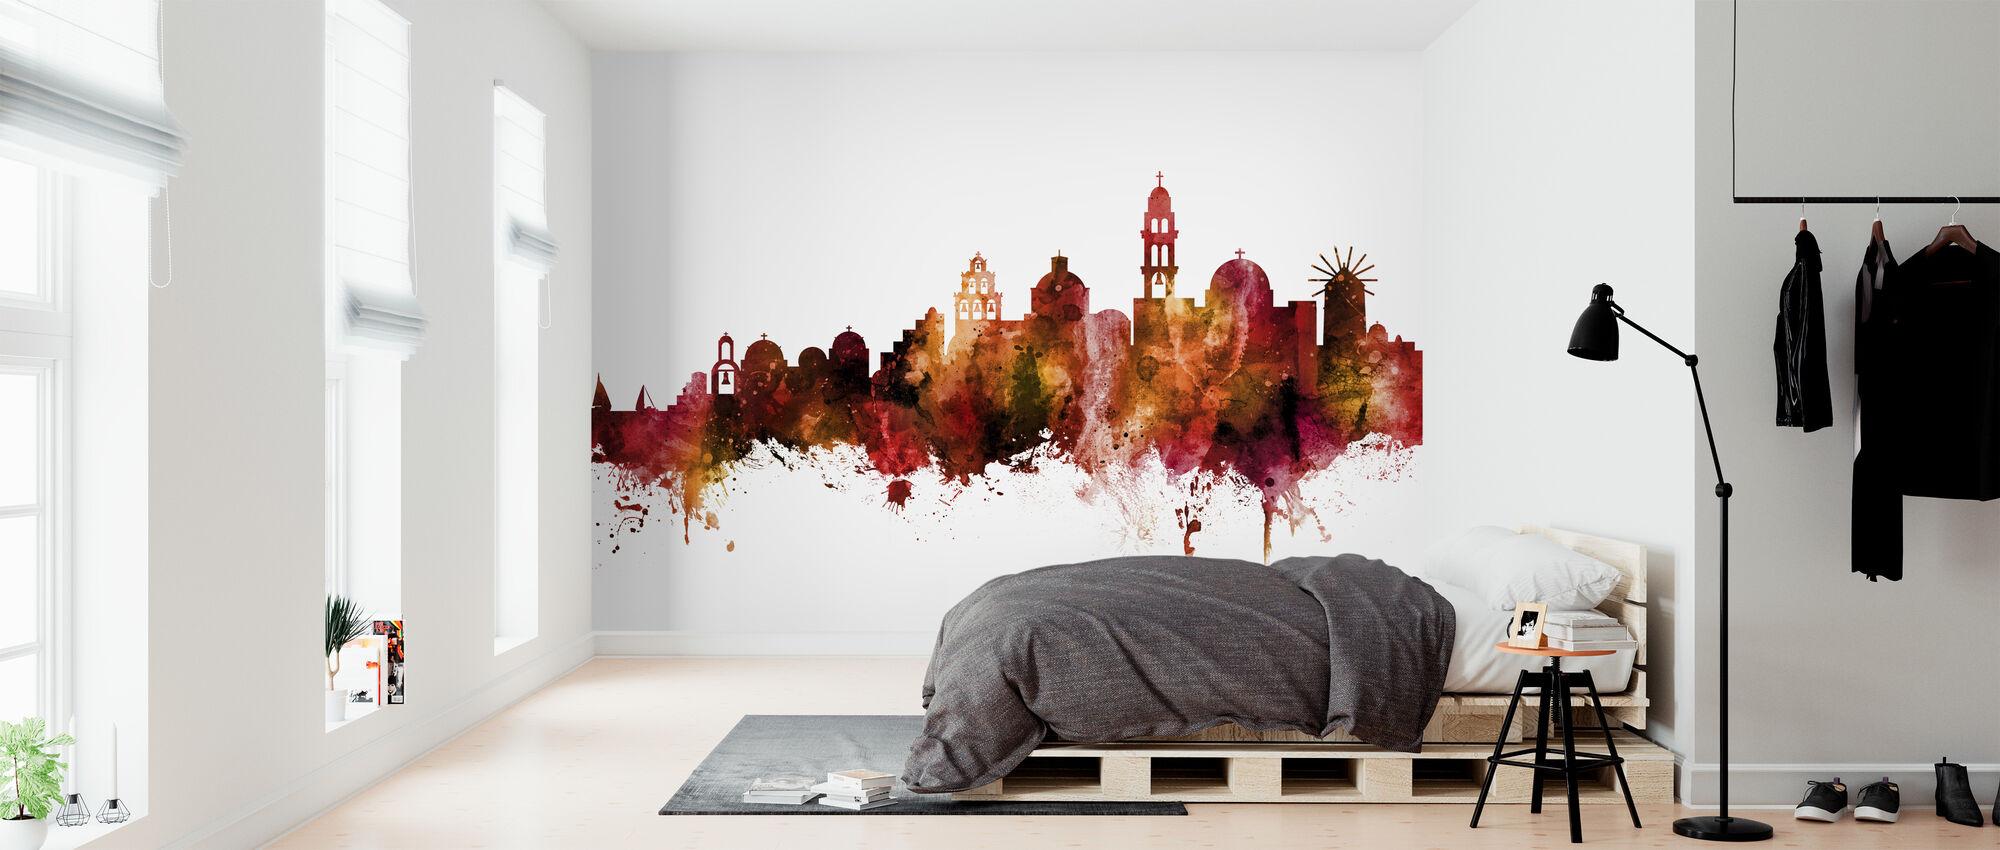 Santorini Skyline - Wallpaper - Bedroom